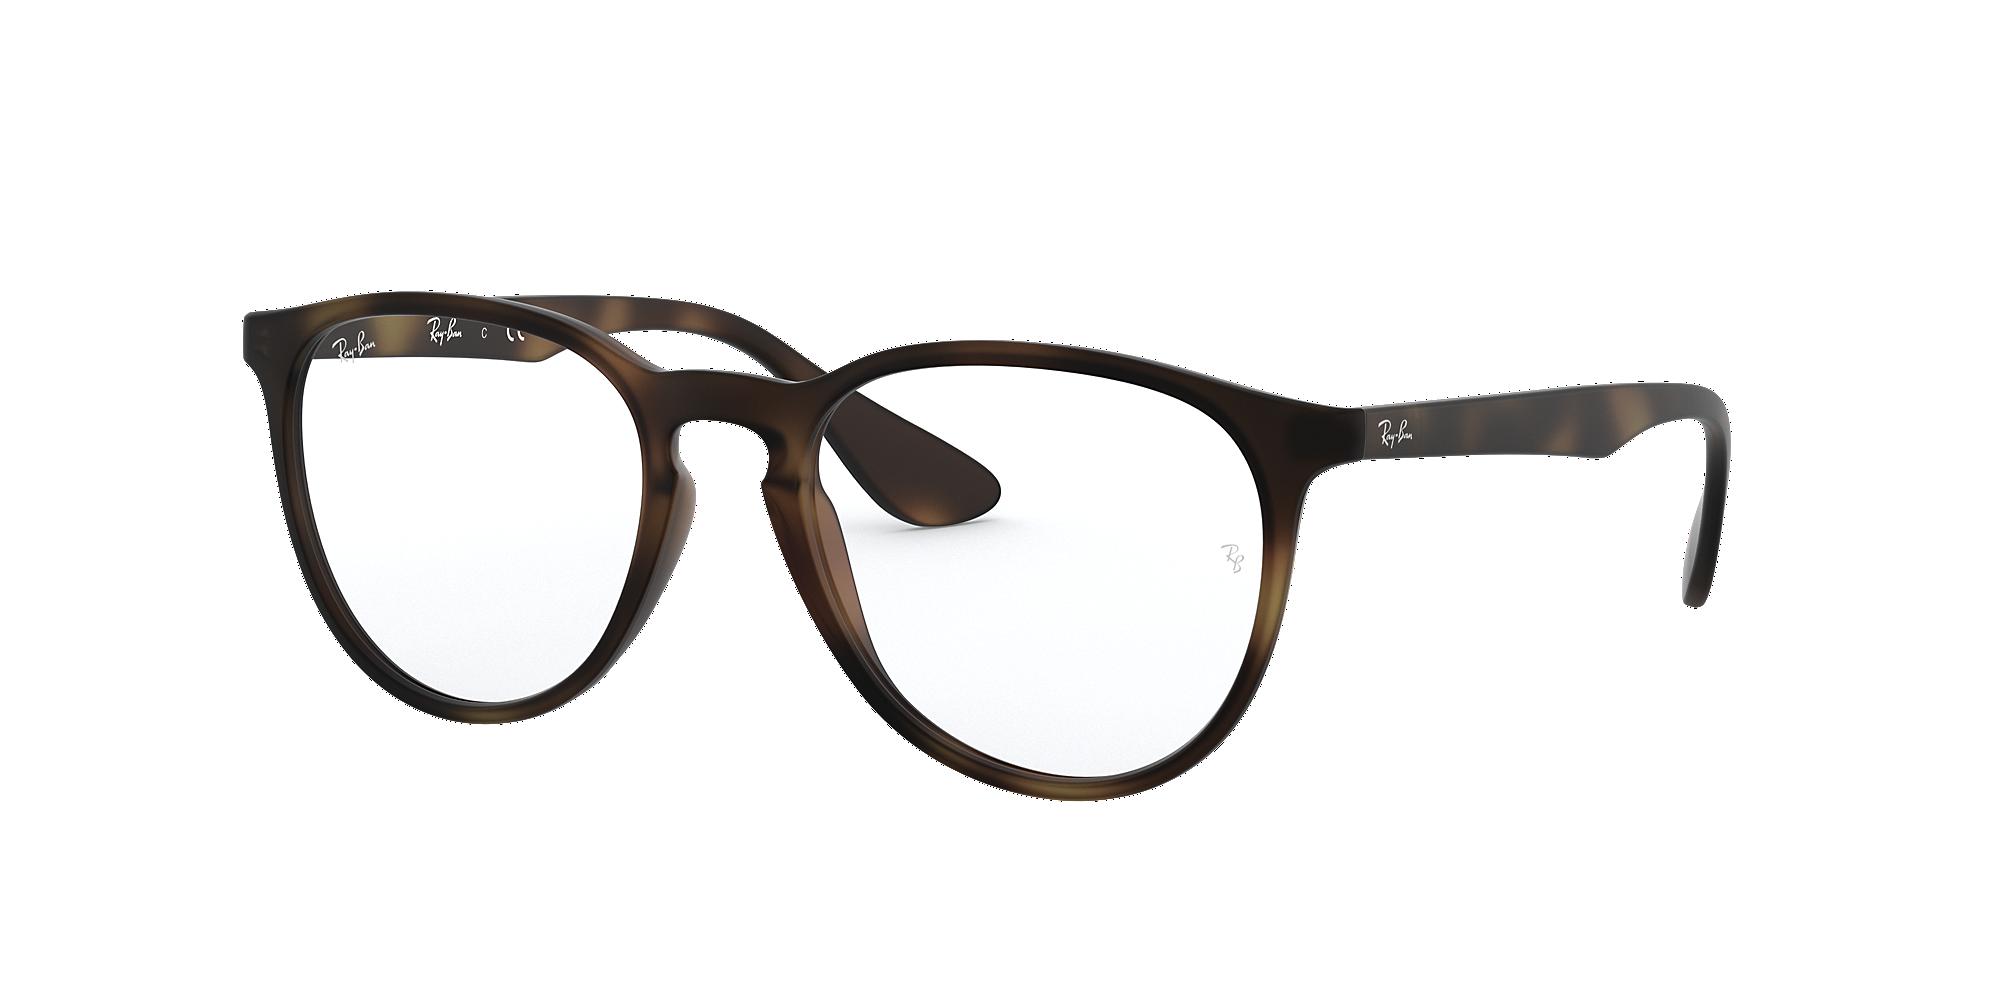 frames ban rx7046 productname opsm